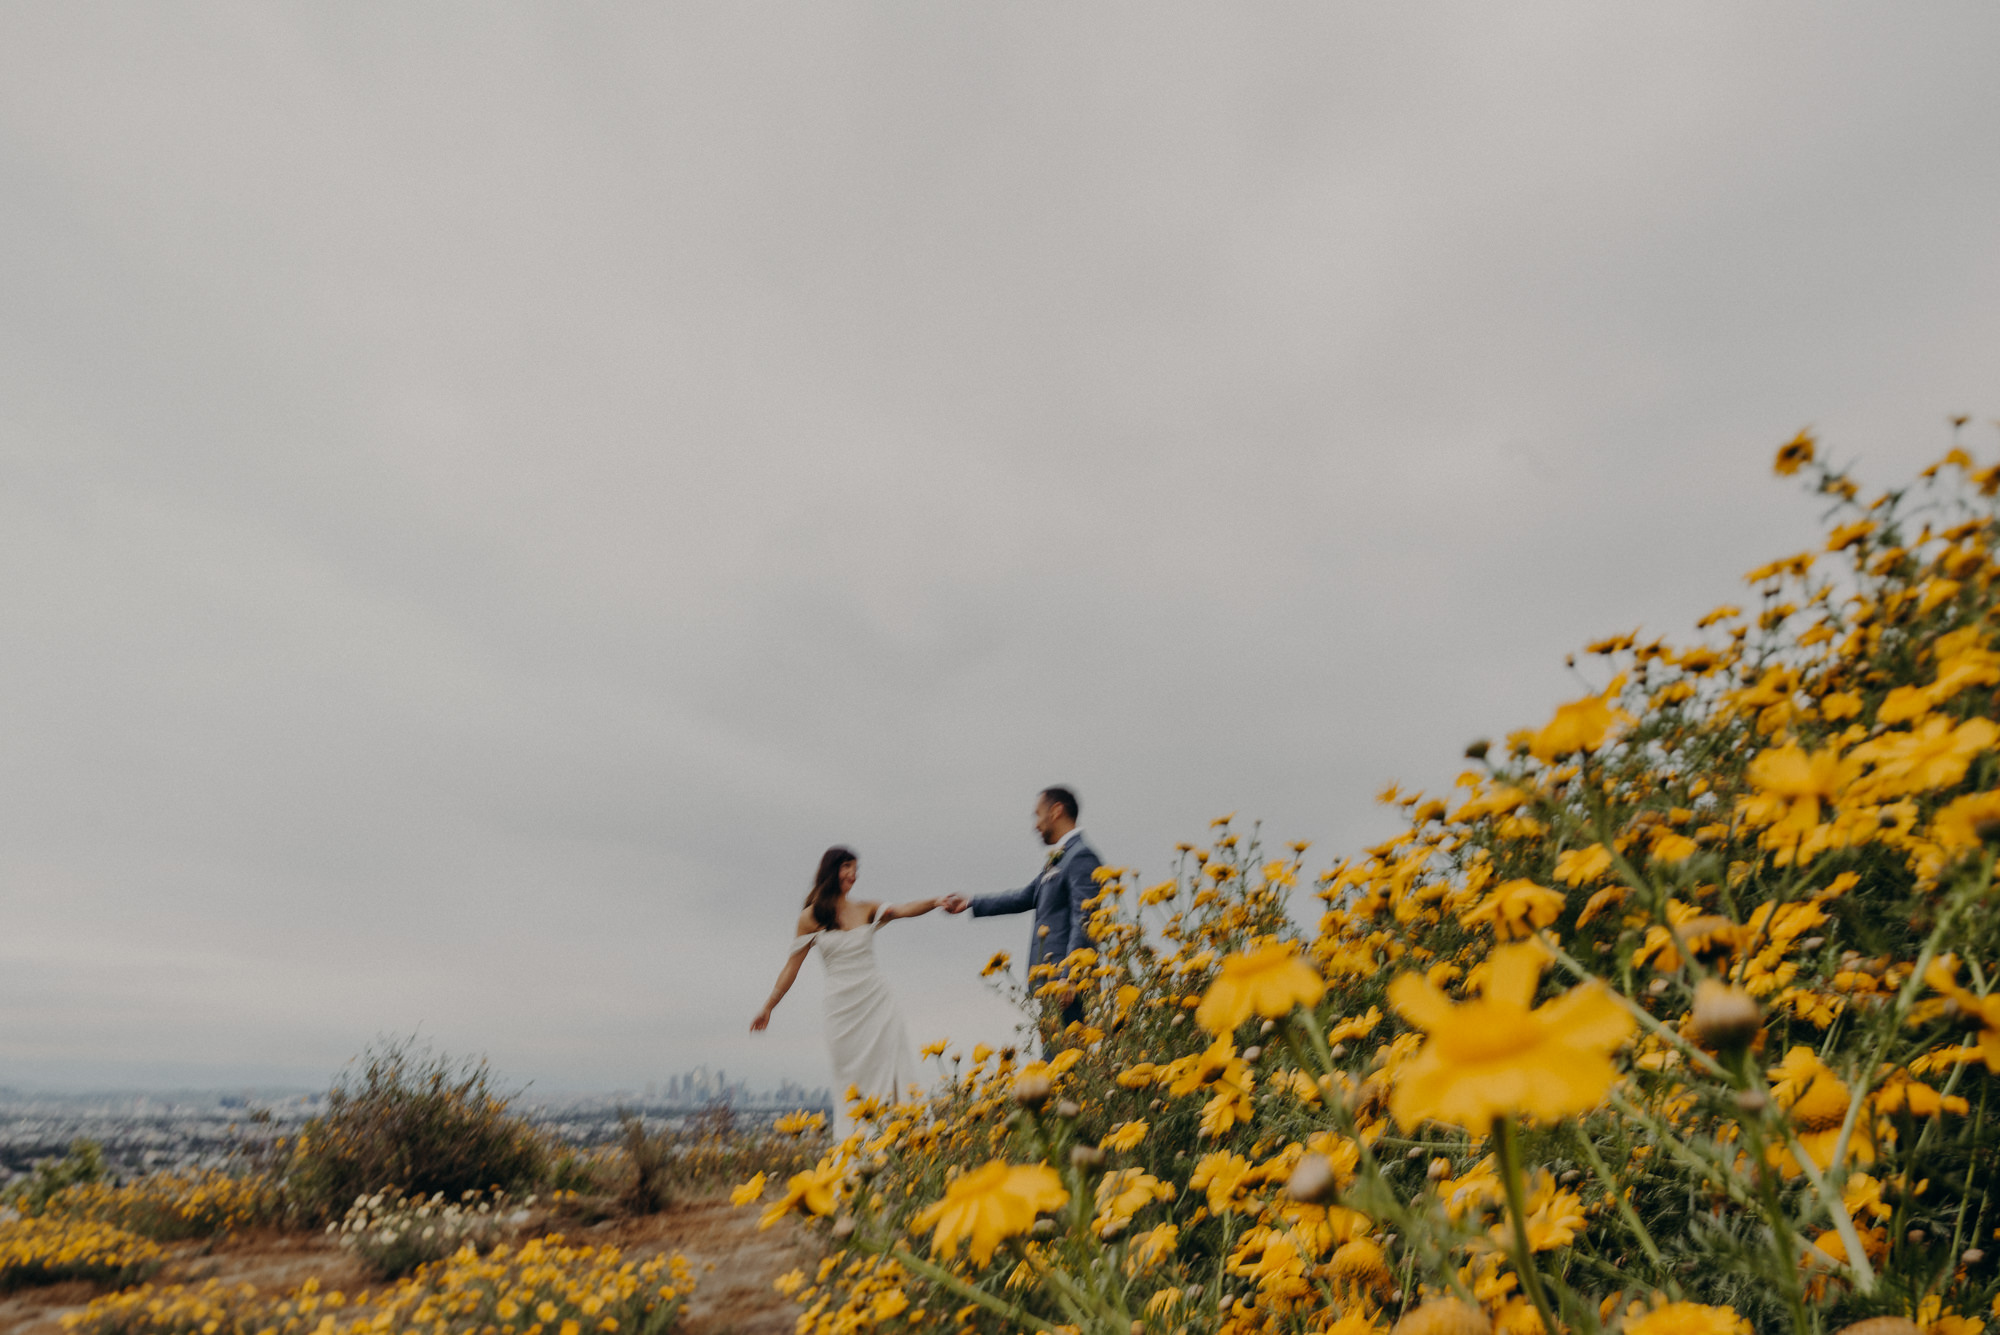 elopement photographer in los angeles - la wedding photographer - isaiahandtaylor.com-048.jpg